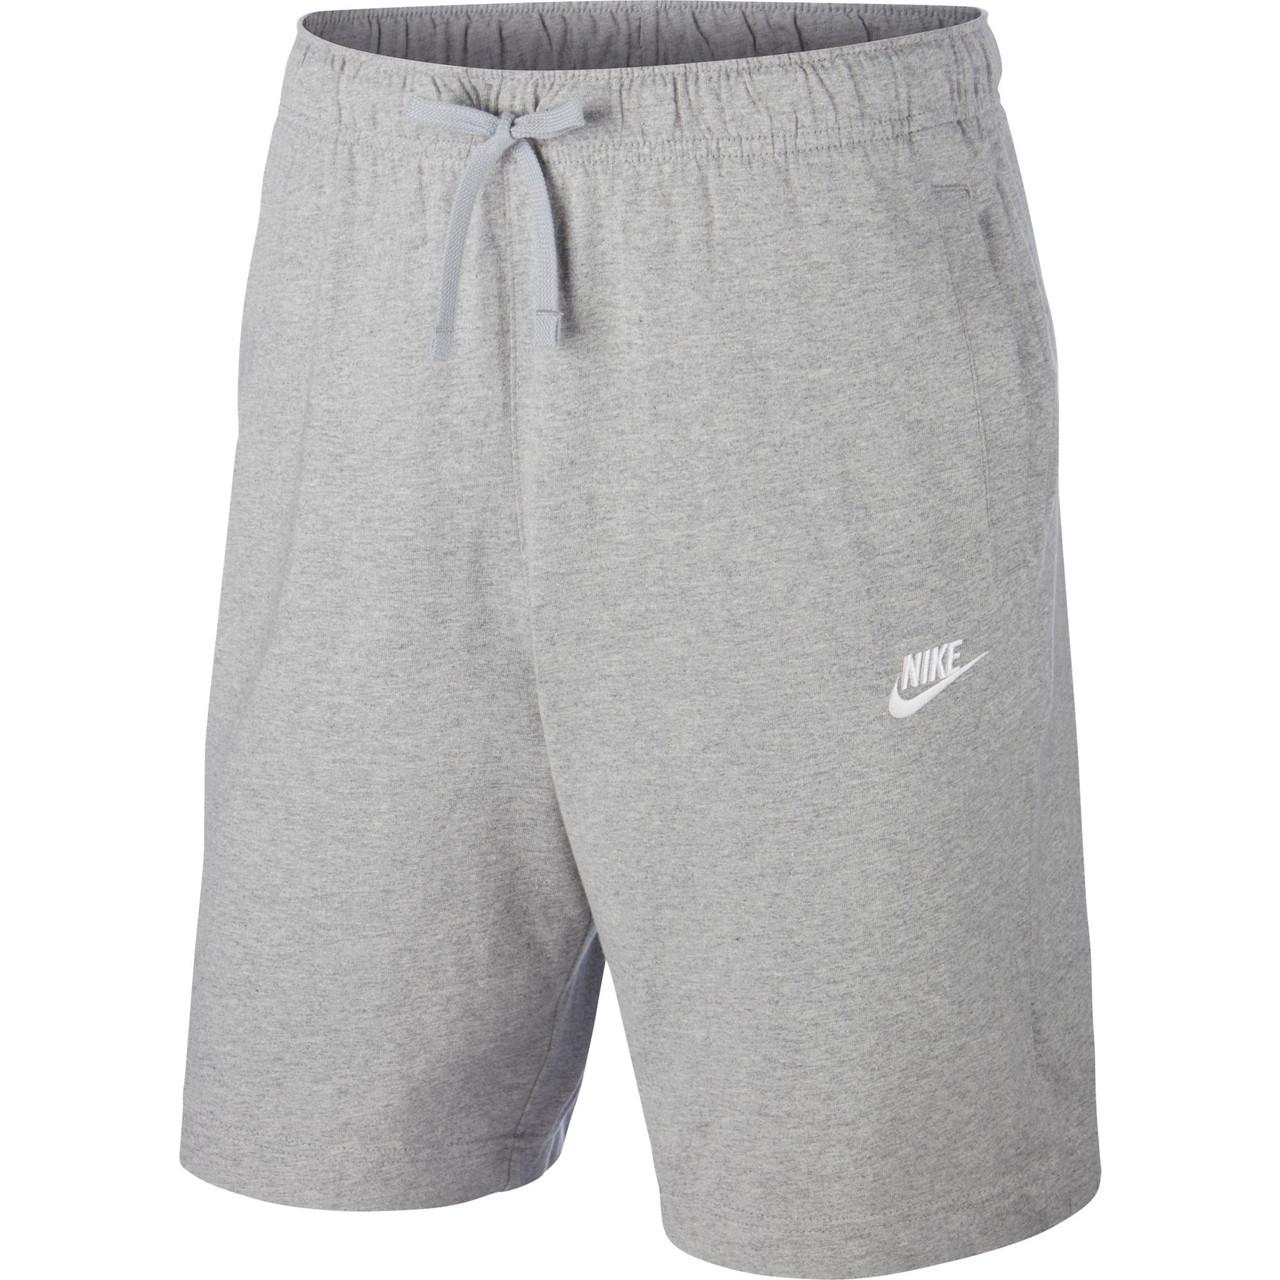 Nike Men's Team Sportswear Short - Dark Grey/White